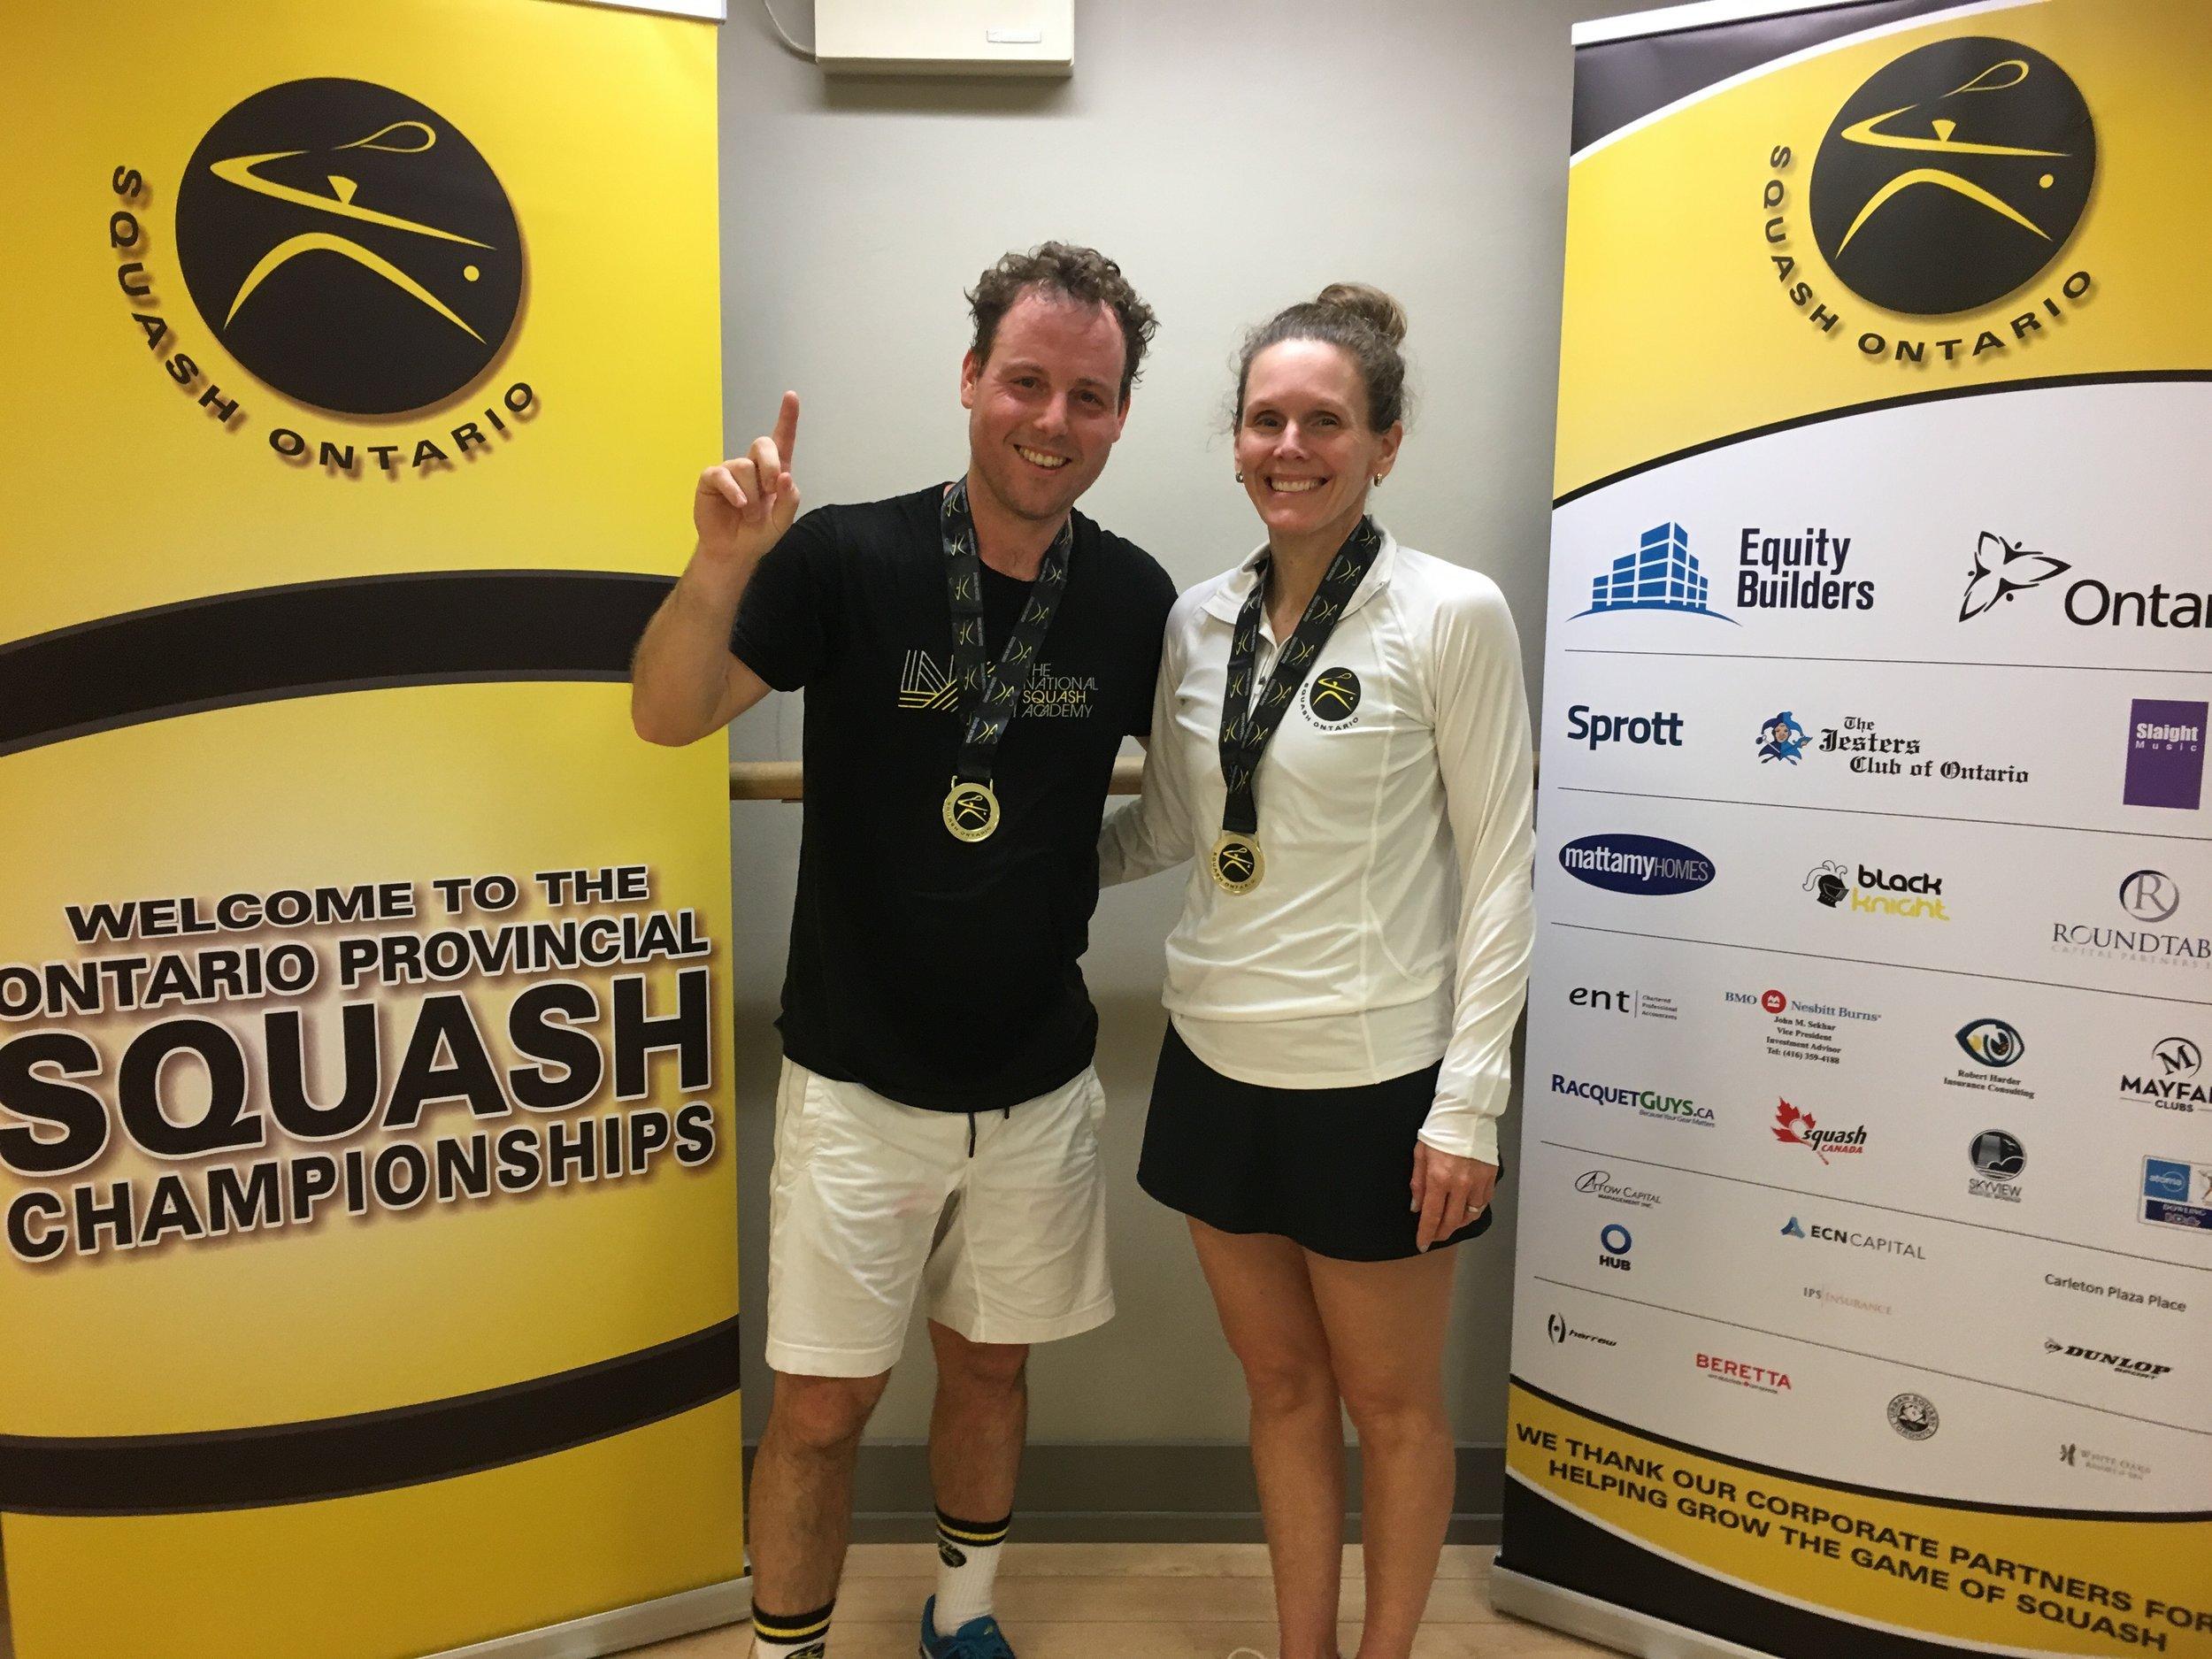 Seanna Keating, Women's Open Champion with Squash Ontario's Jamie Nicholls